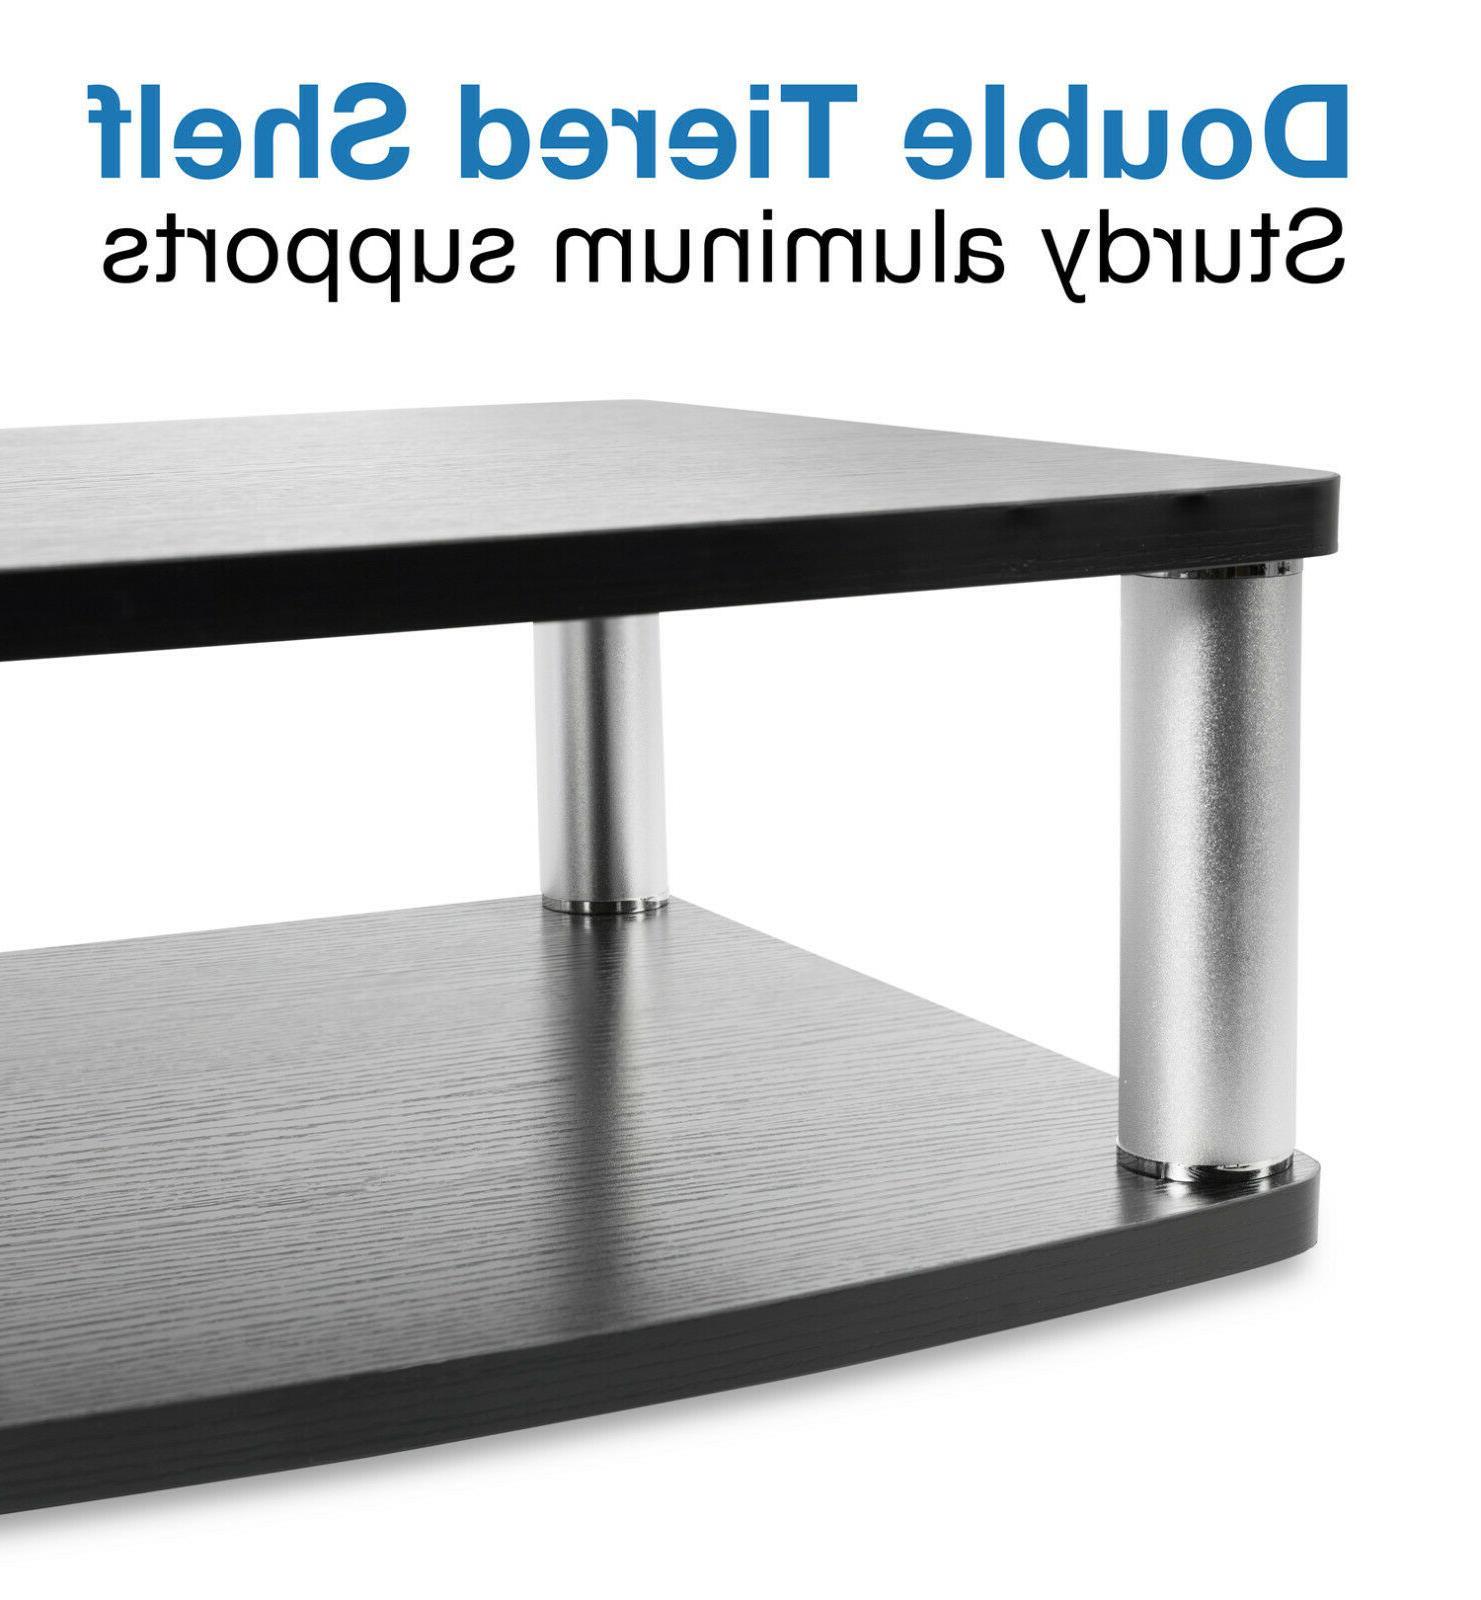 Mount-It! Turntable TV AV TVs